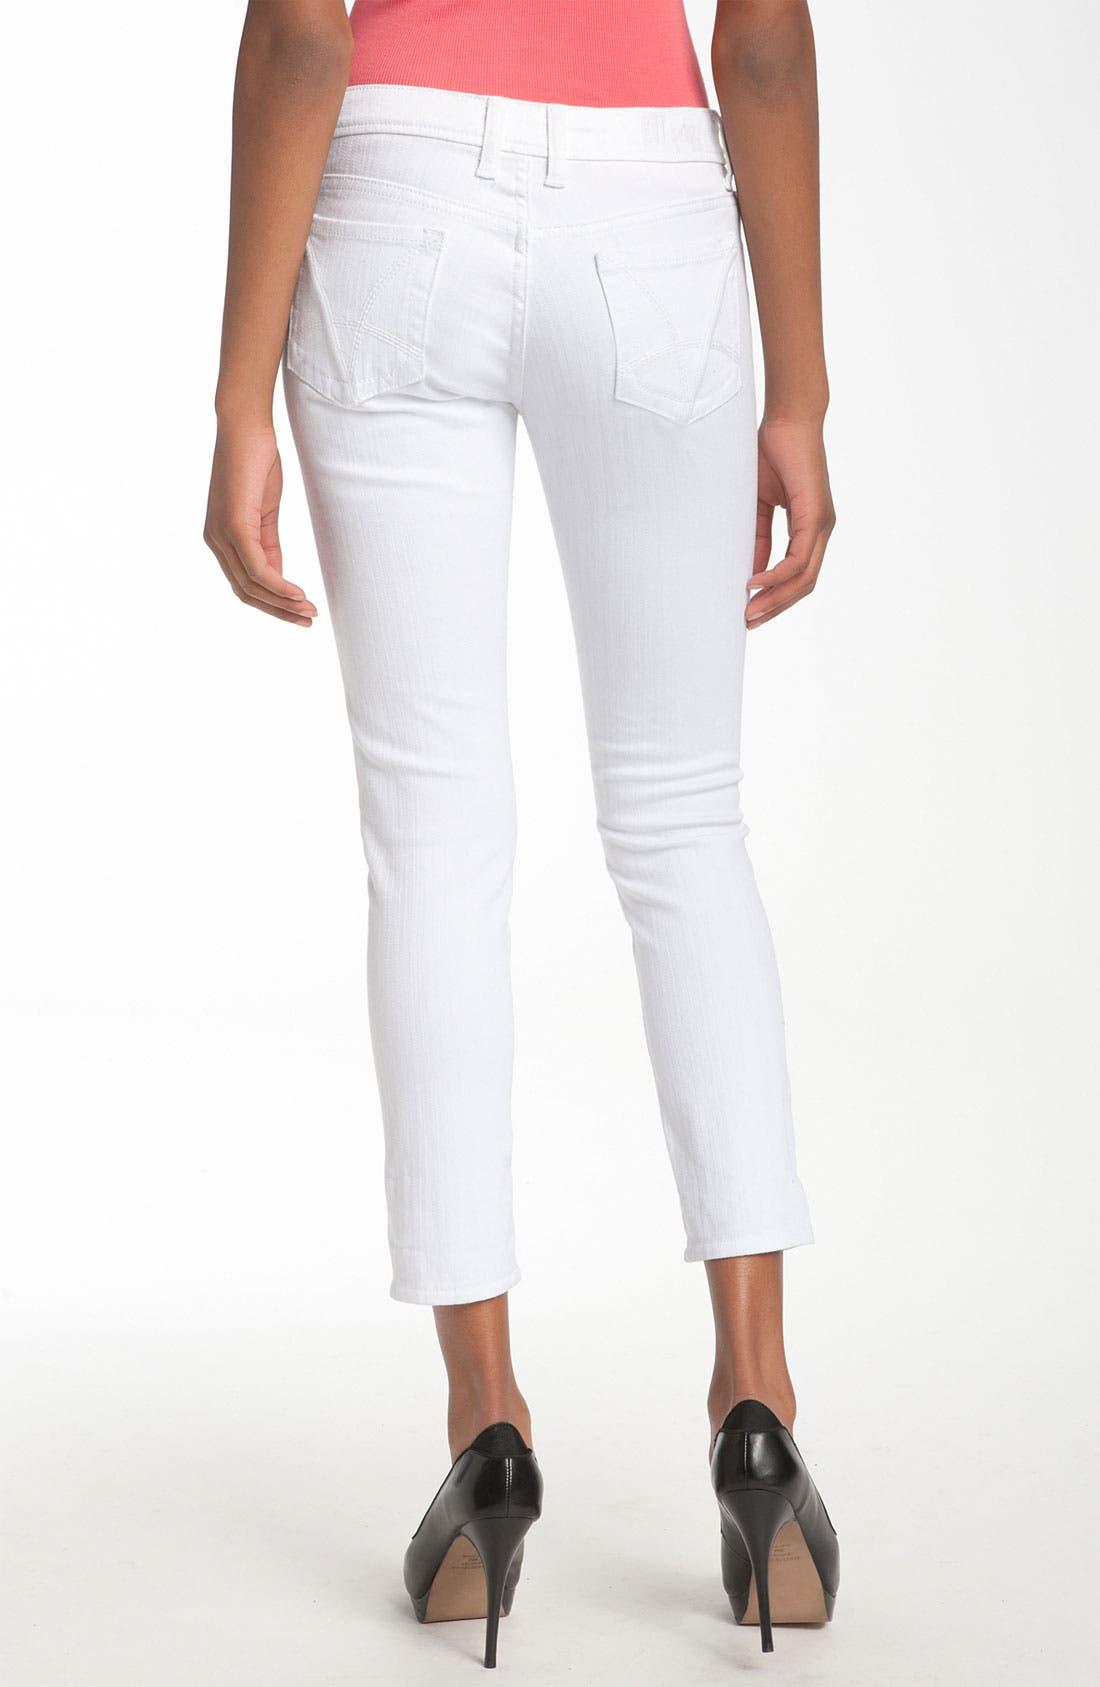 Main Image - KUT from the Kloth 'Catherine' Slim Boyfriend Jeans (White Wash)